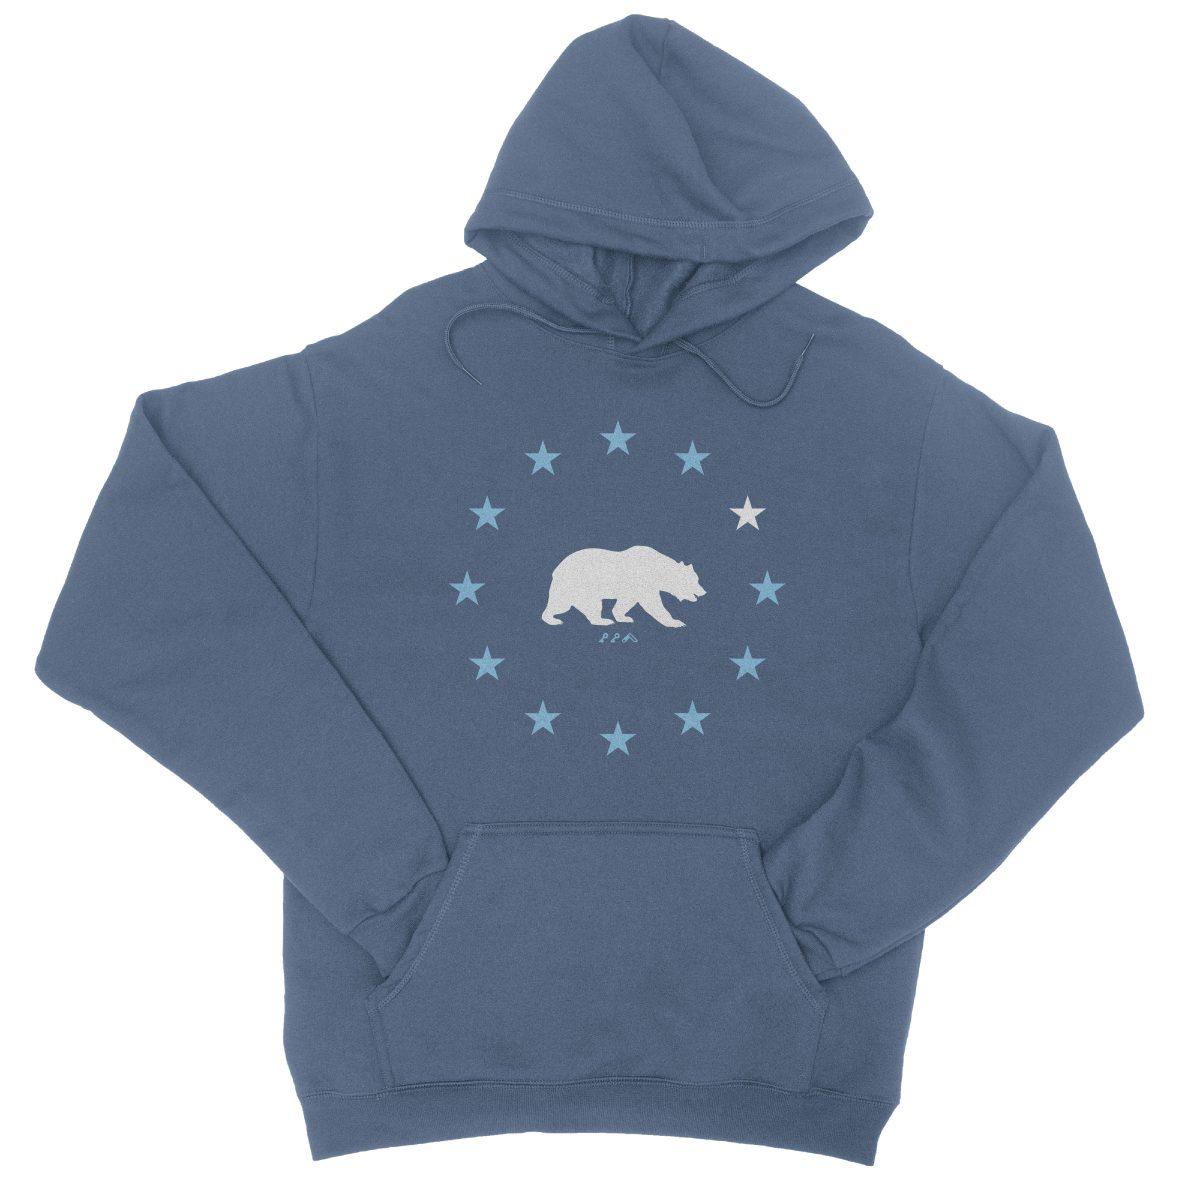 STAR GAZING california republic cali bear hoodie in indigo by kikicutt